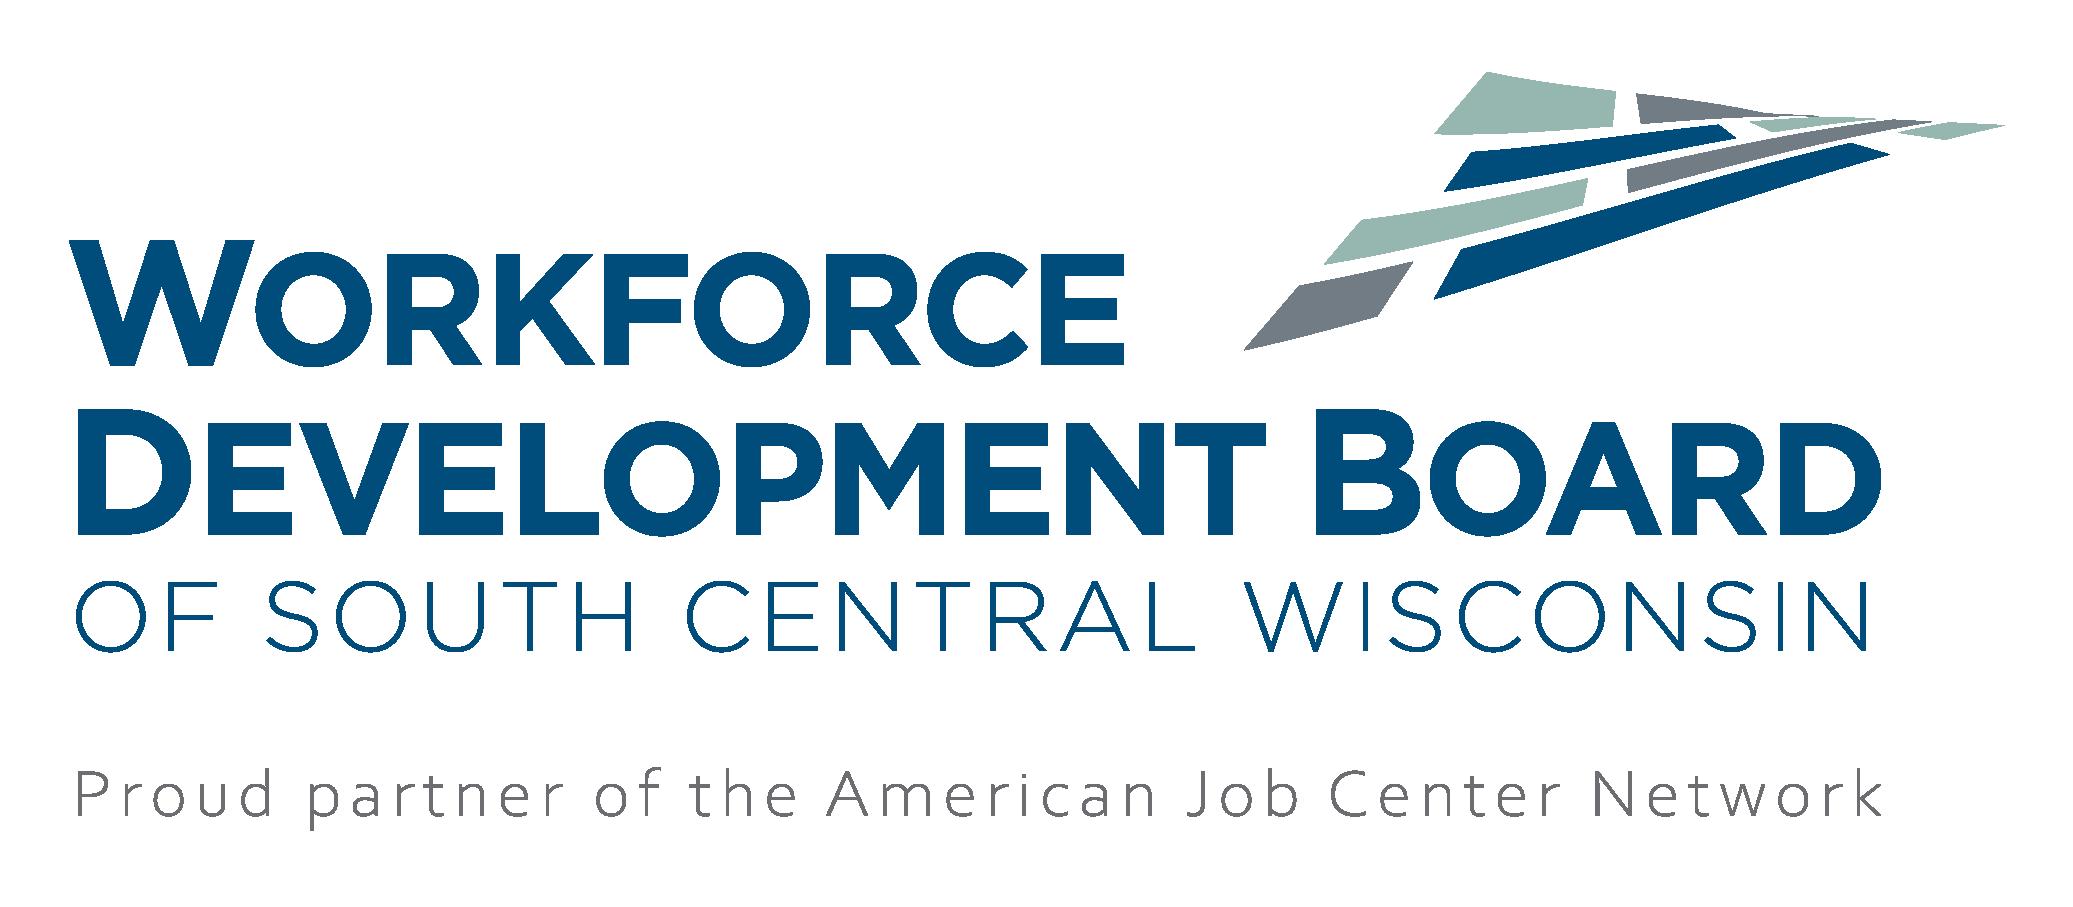 Workforce development Board of South Central Wisconsin logo with AJC tagline